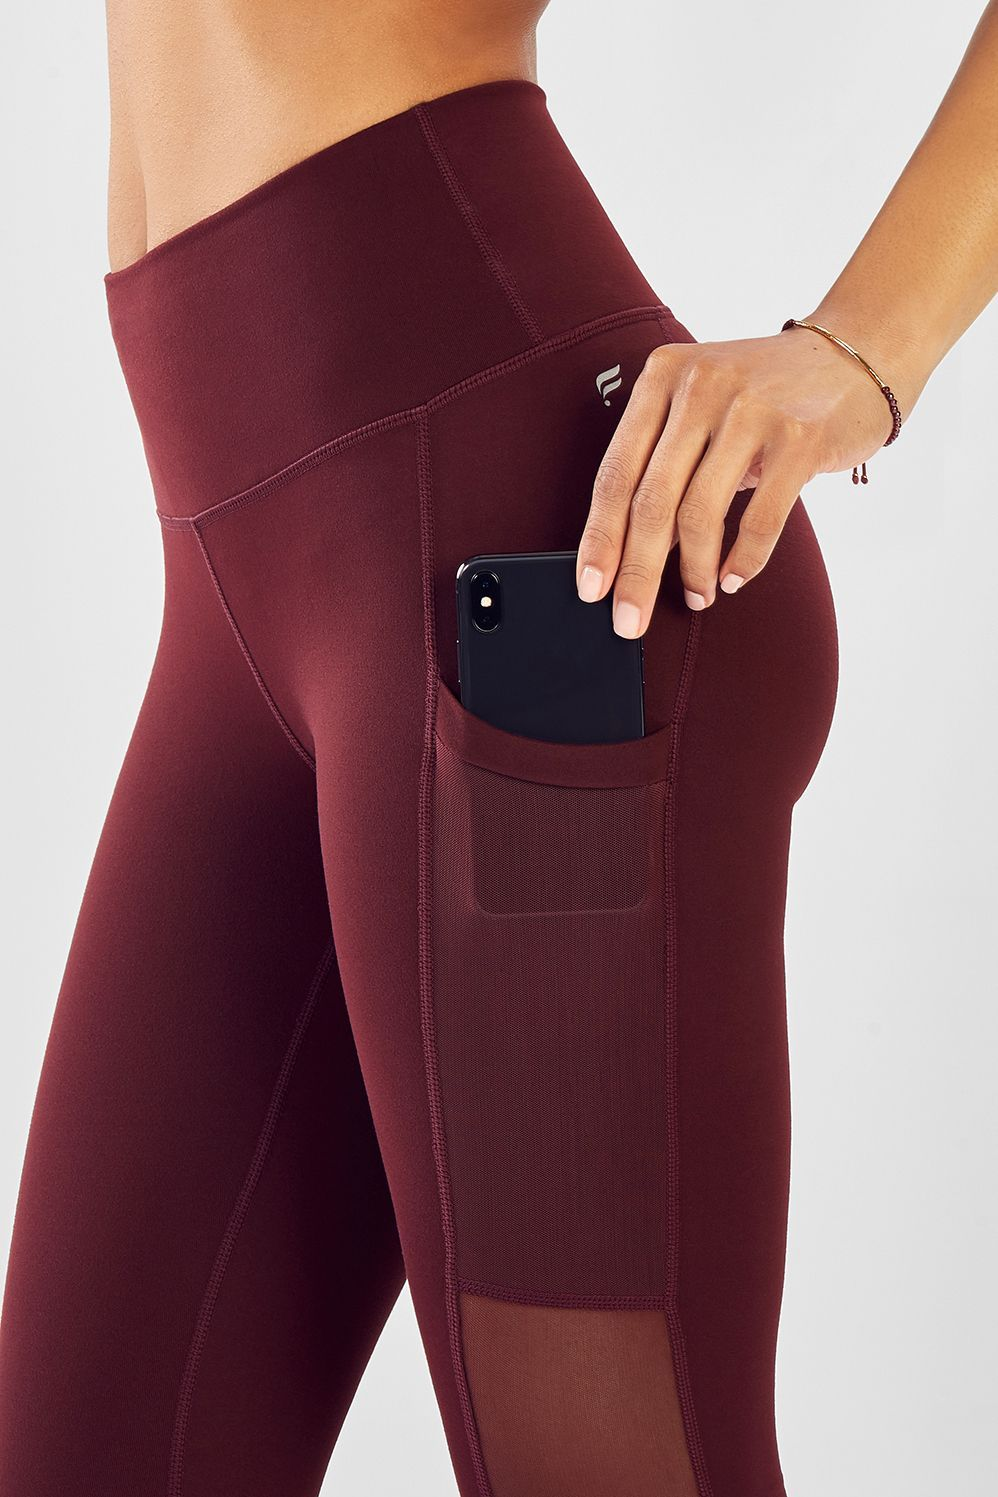 1efece8fe8149f Mila Pocket Legging | Outfit | Burgundy leggings, Pocket, Heeled mules